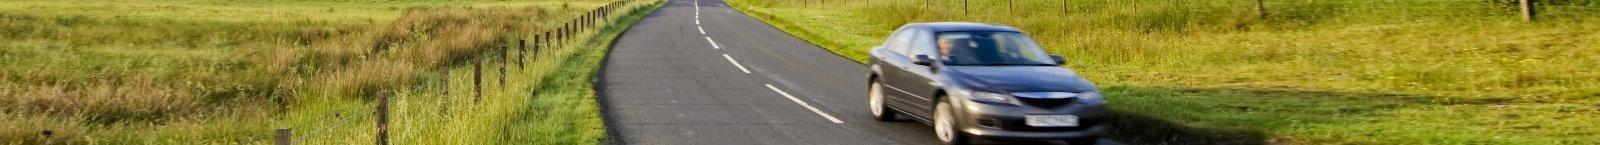 Shine Lawyers vehicle safety | Shine Lawyers